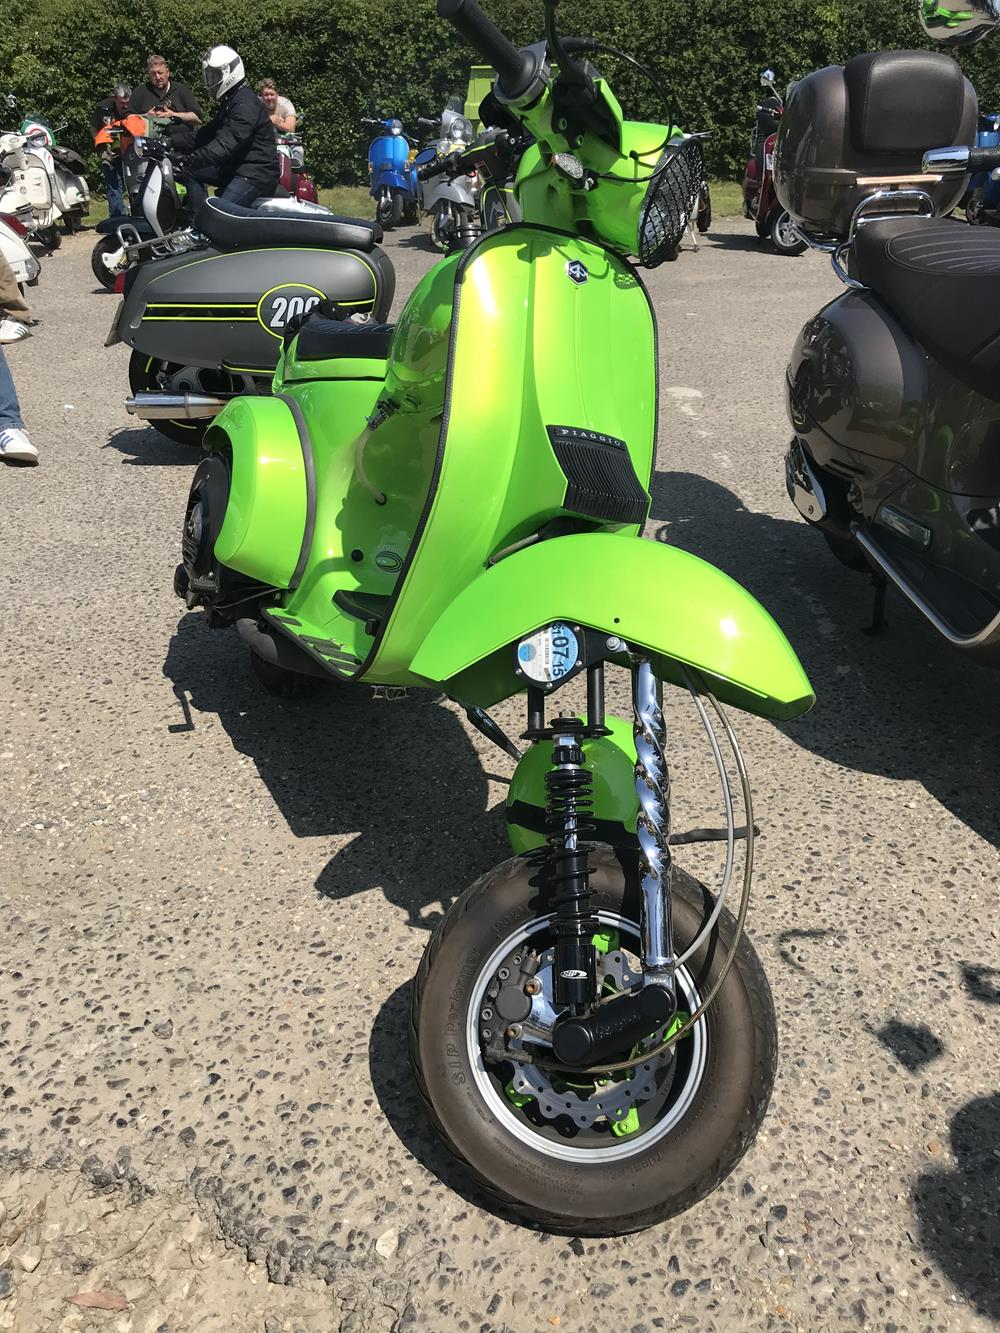 Bright green Vespa chopper scooter